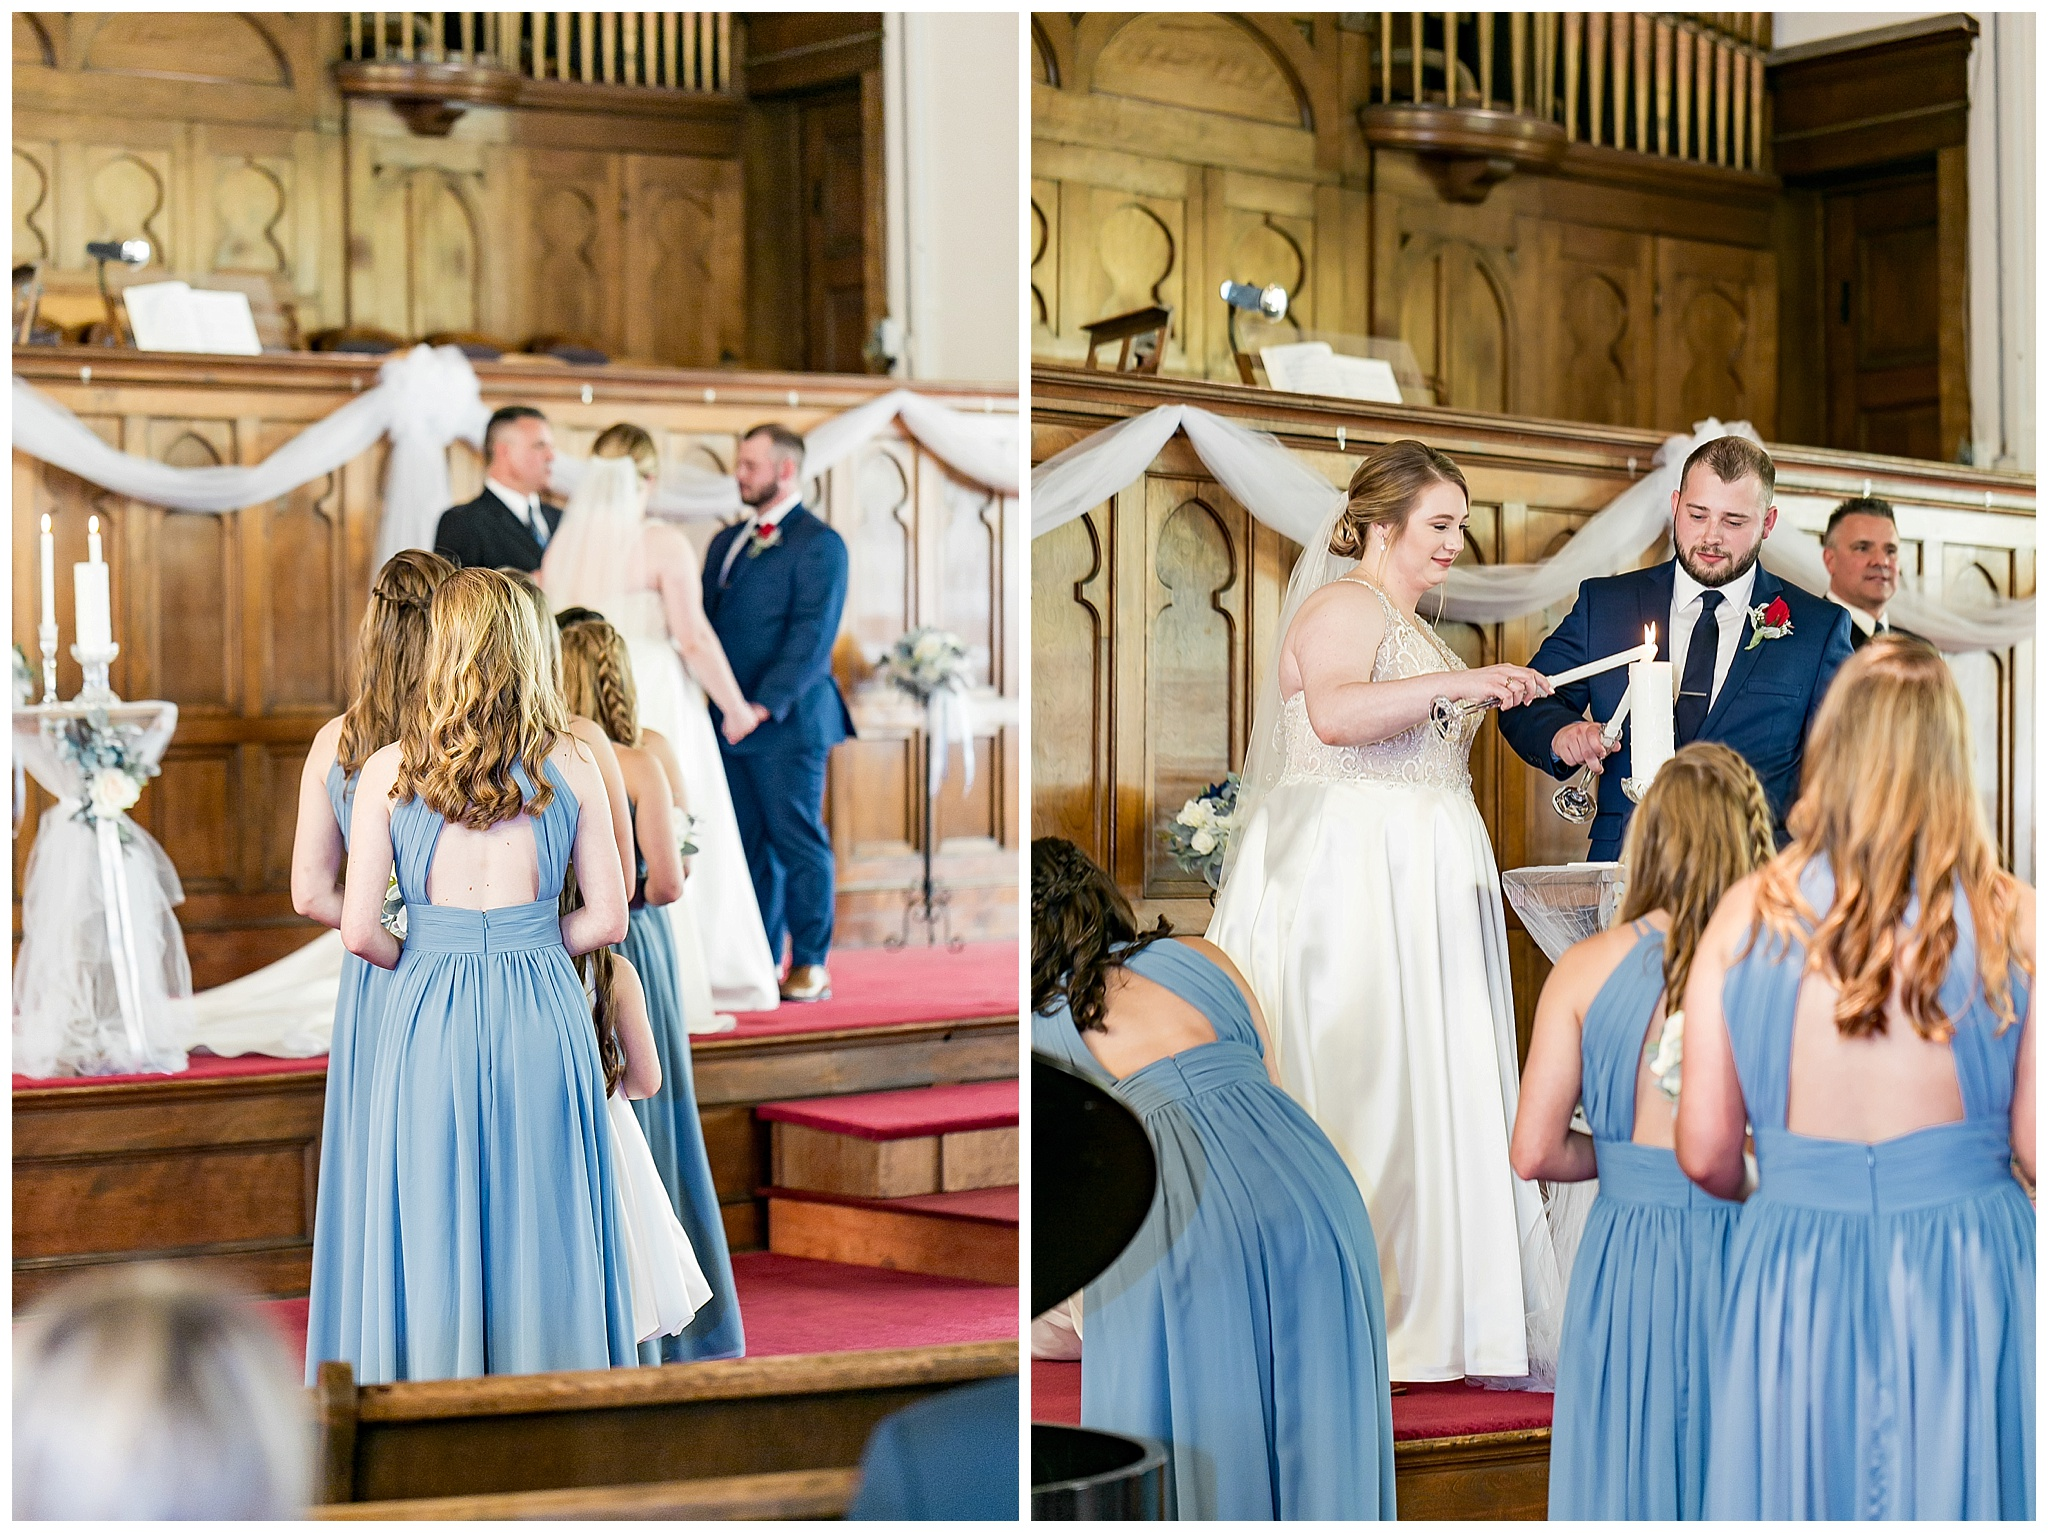 la_casa_grande_wedding_beloit_wisconsin_caynay_photo_0011.jpg